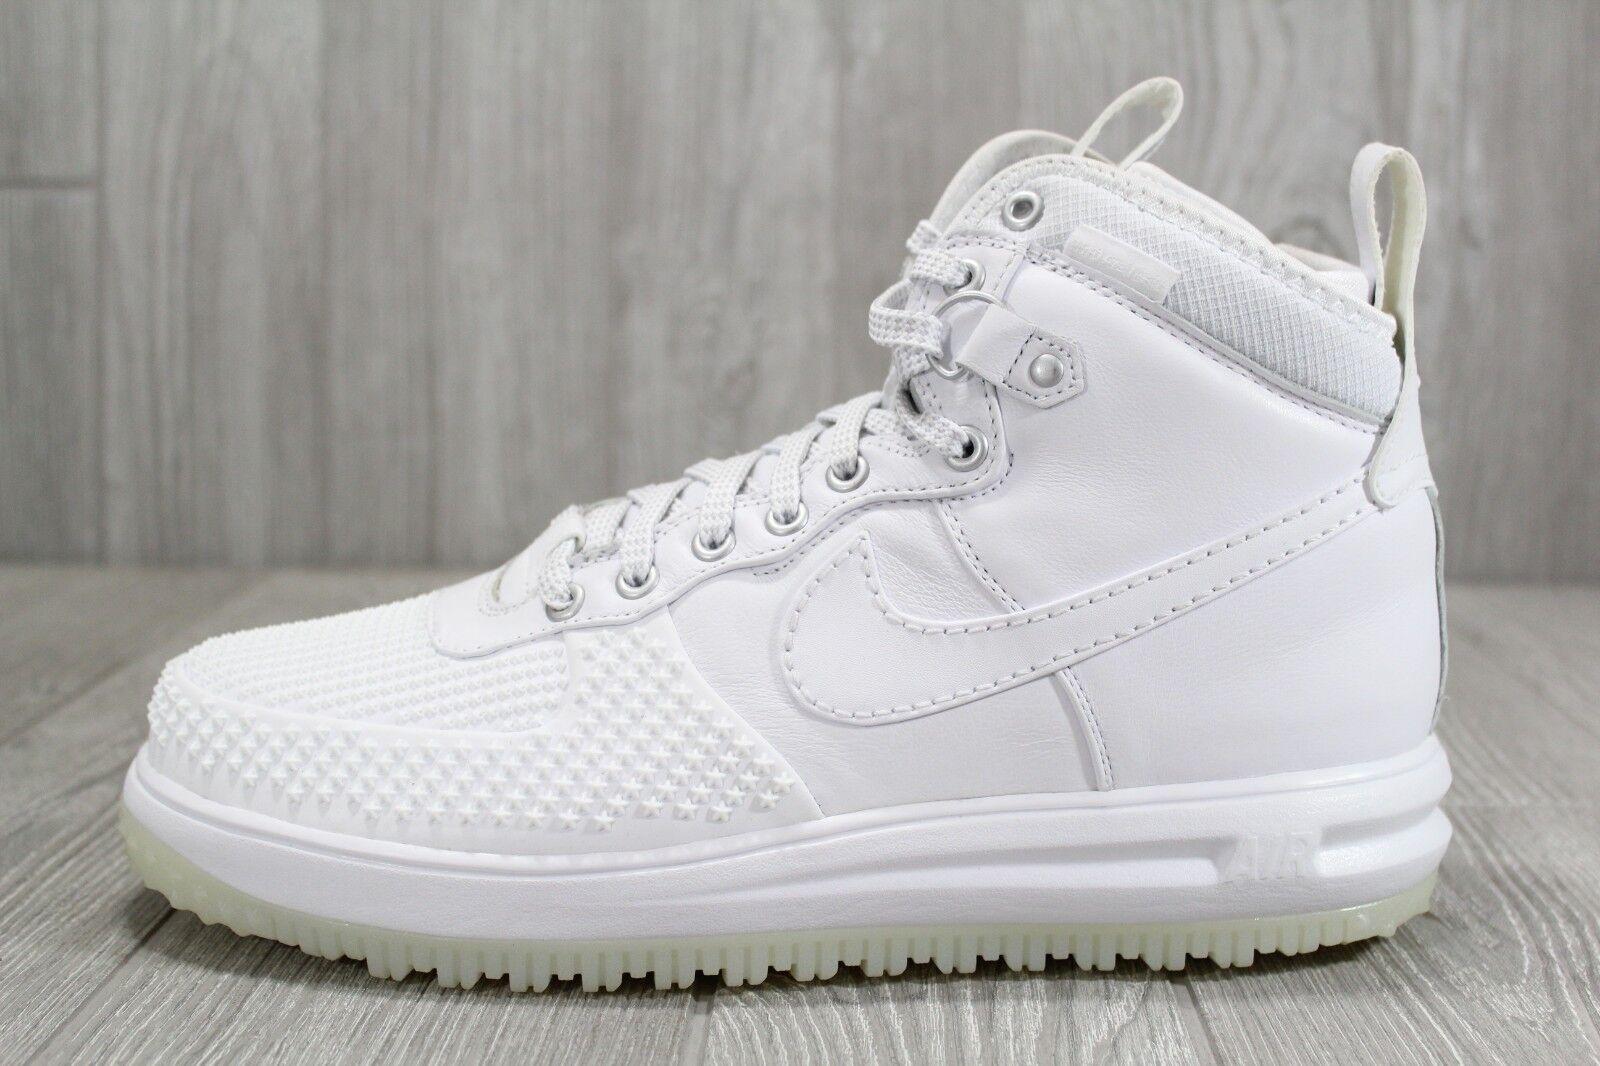 37 Nike Lunar Force 1 Duckboot 805899 101 Triple White shoes Mens Size 11 13